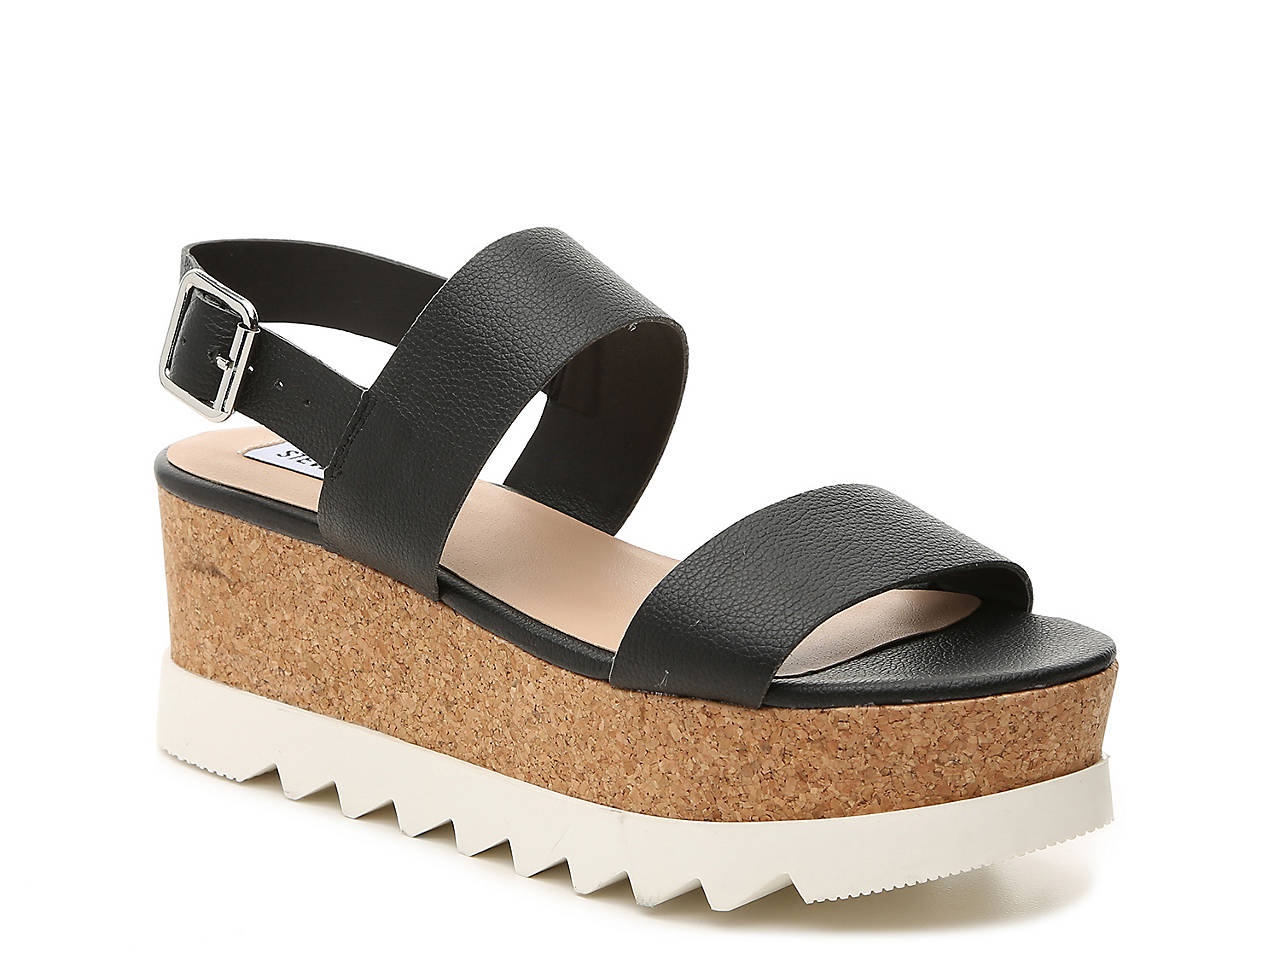 1e40e1d1569 Steve Madden Krista Platform Sandal Women s Shoes